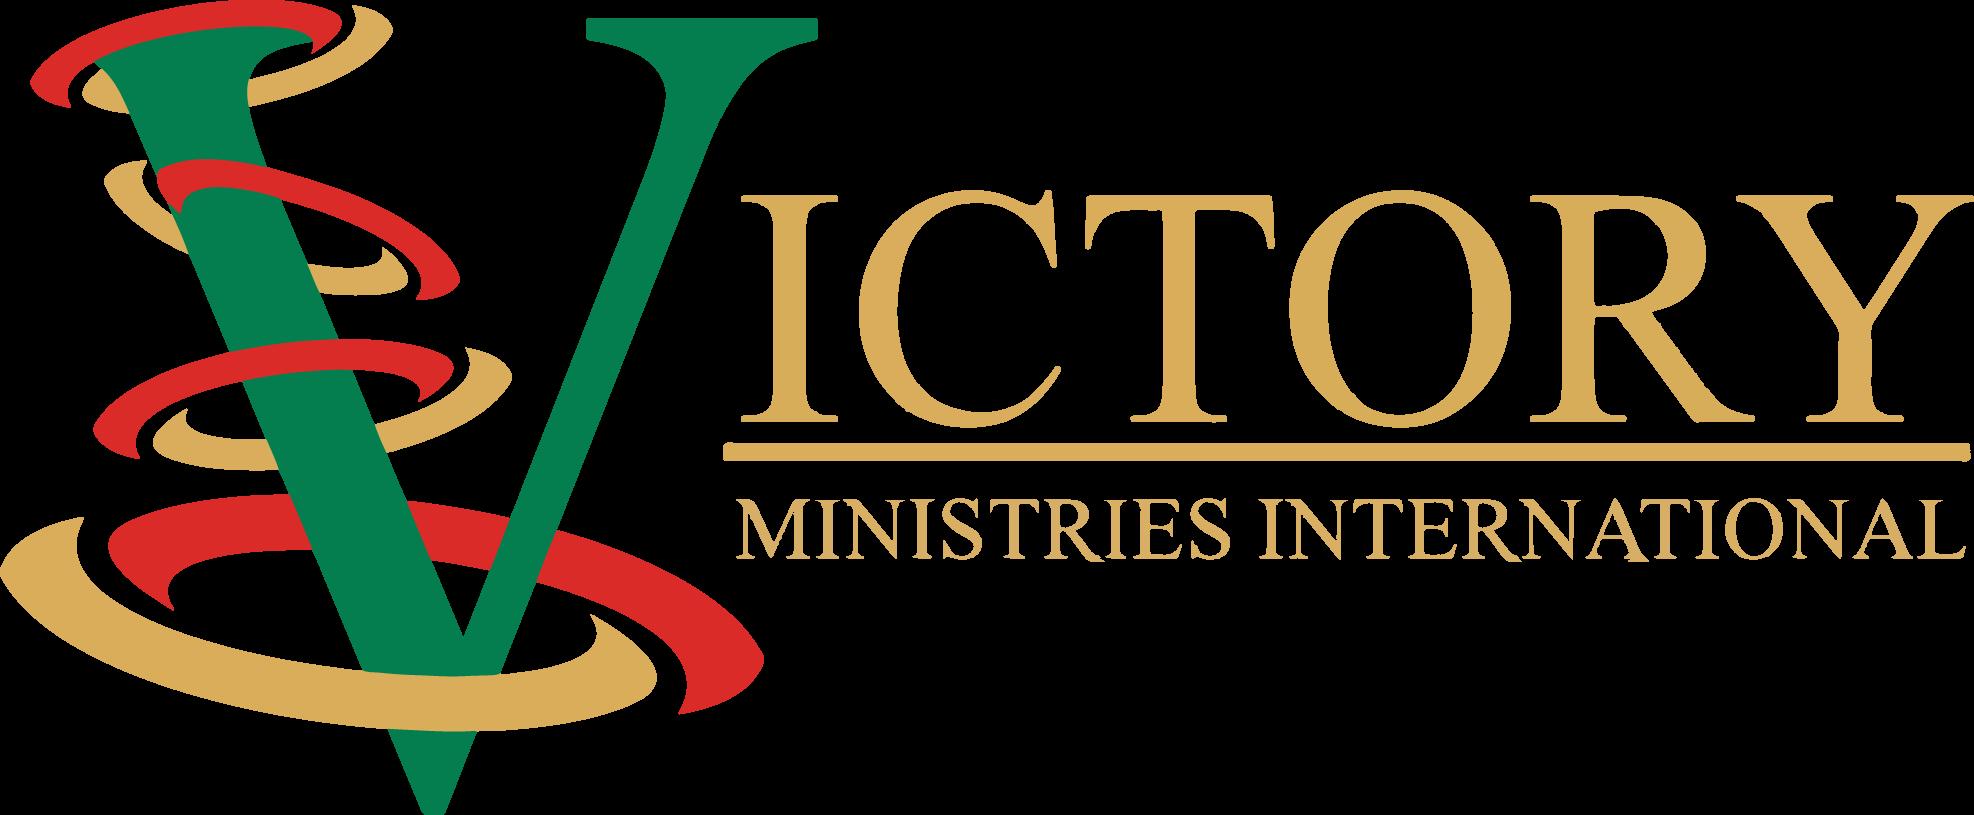 victory ministries international church camp clipart black and white summer church camp clip art